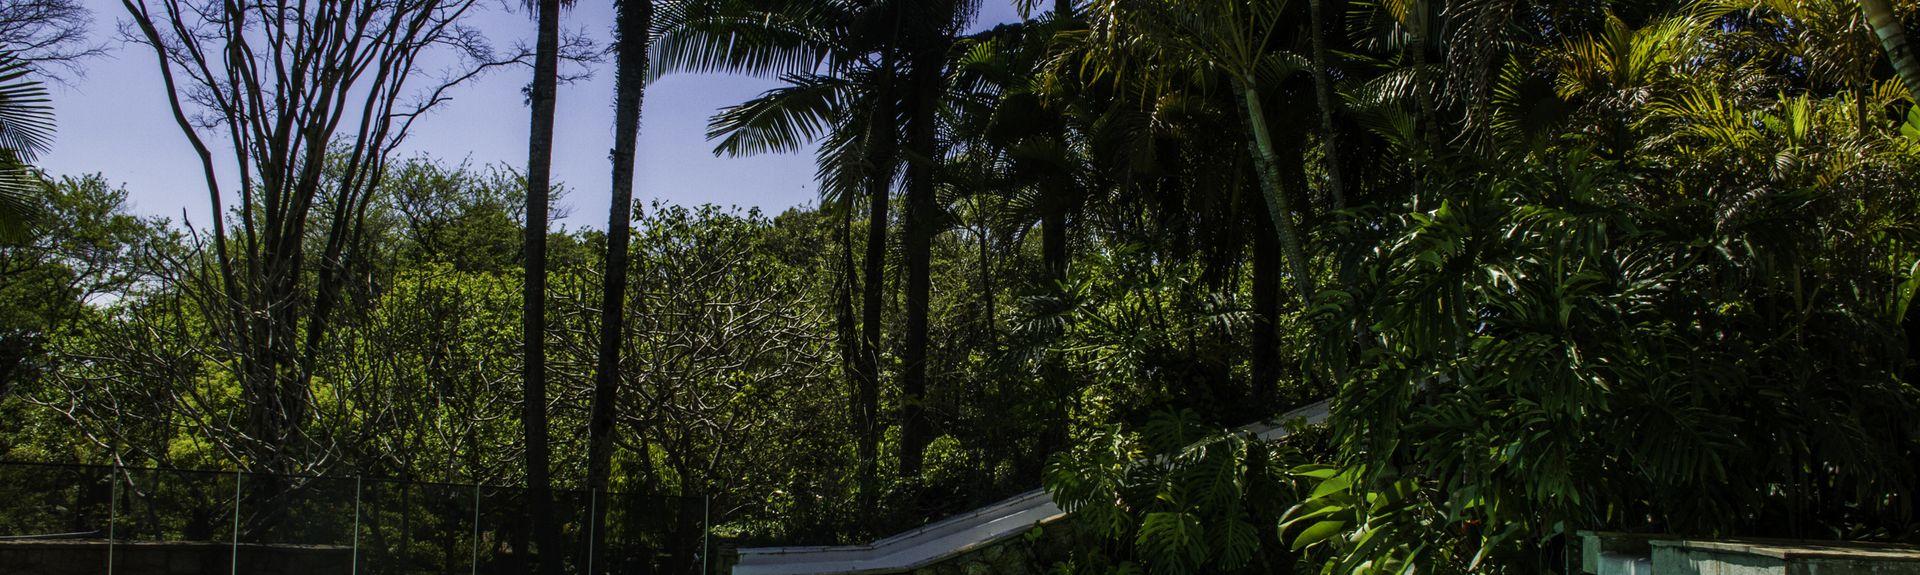 Santana de Parnaiba, Region Südosten, Brasilien